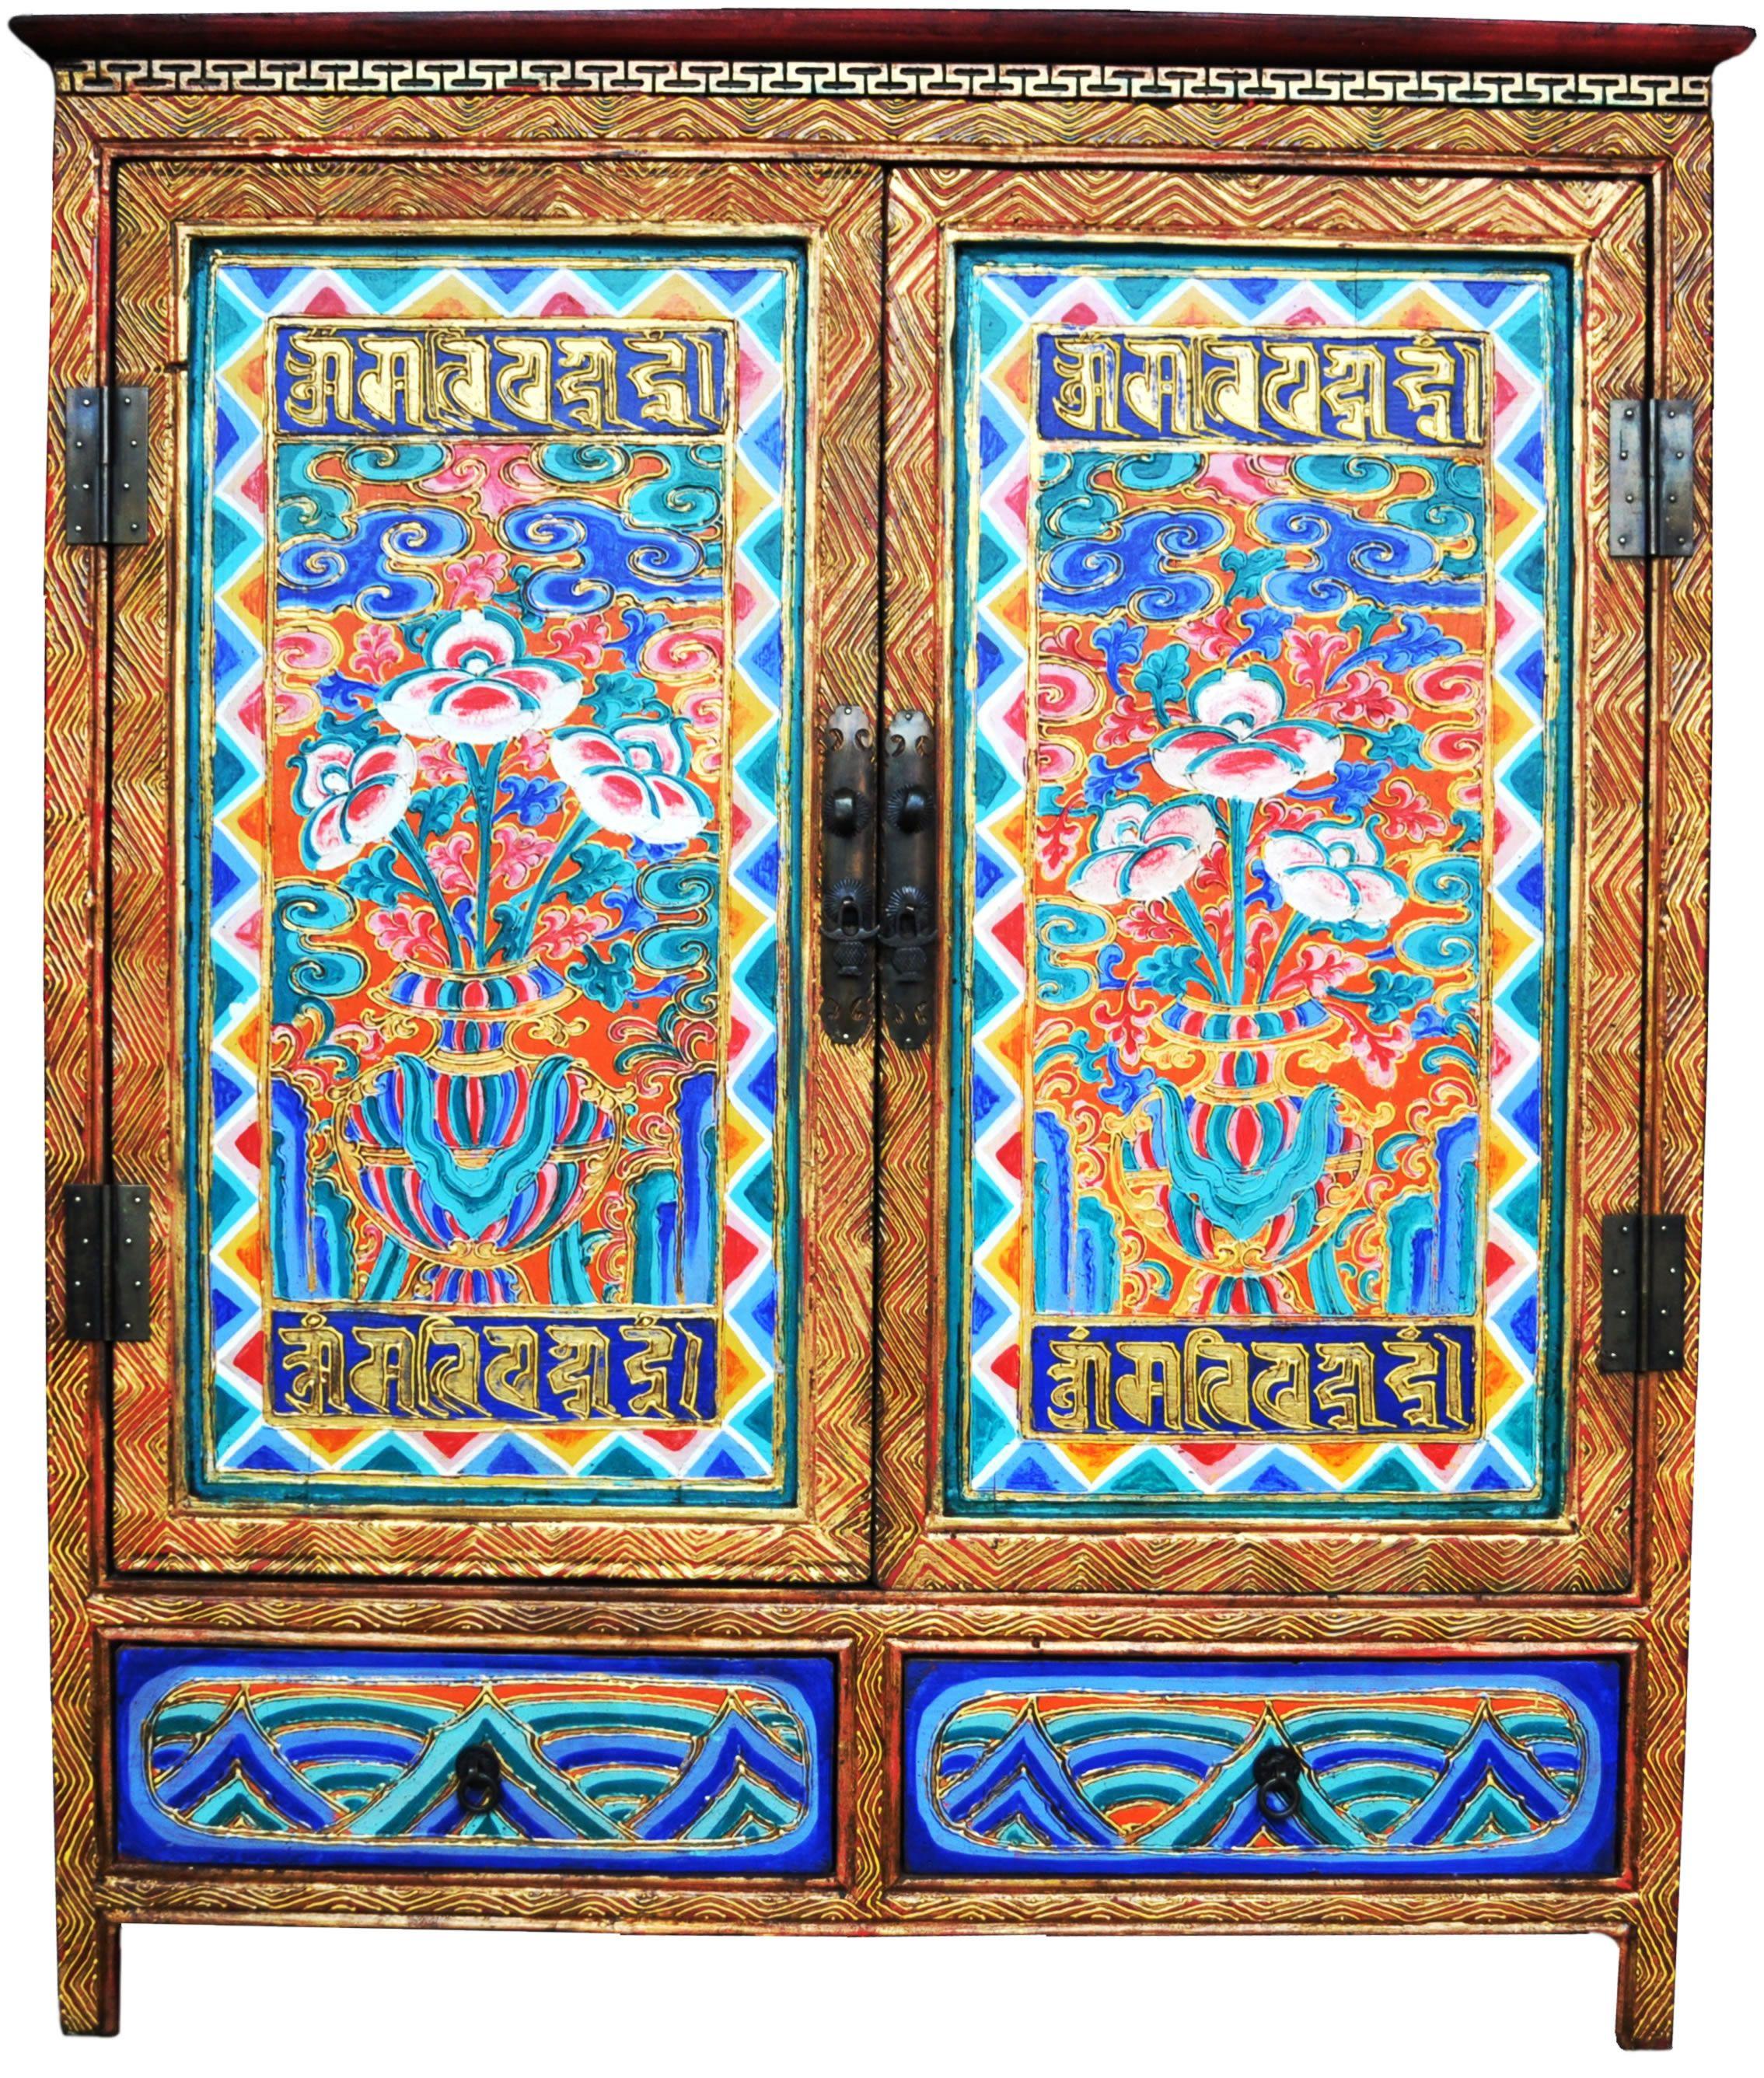 Hand Painted Tibetan Cabinet Furniture Om Mani Padme Hum